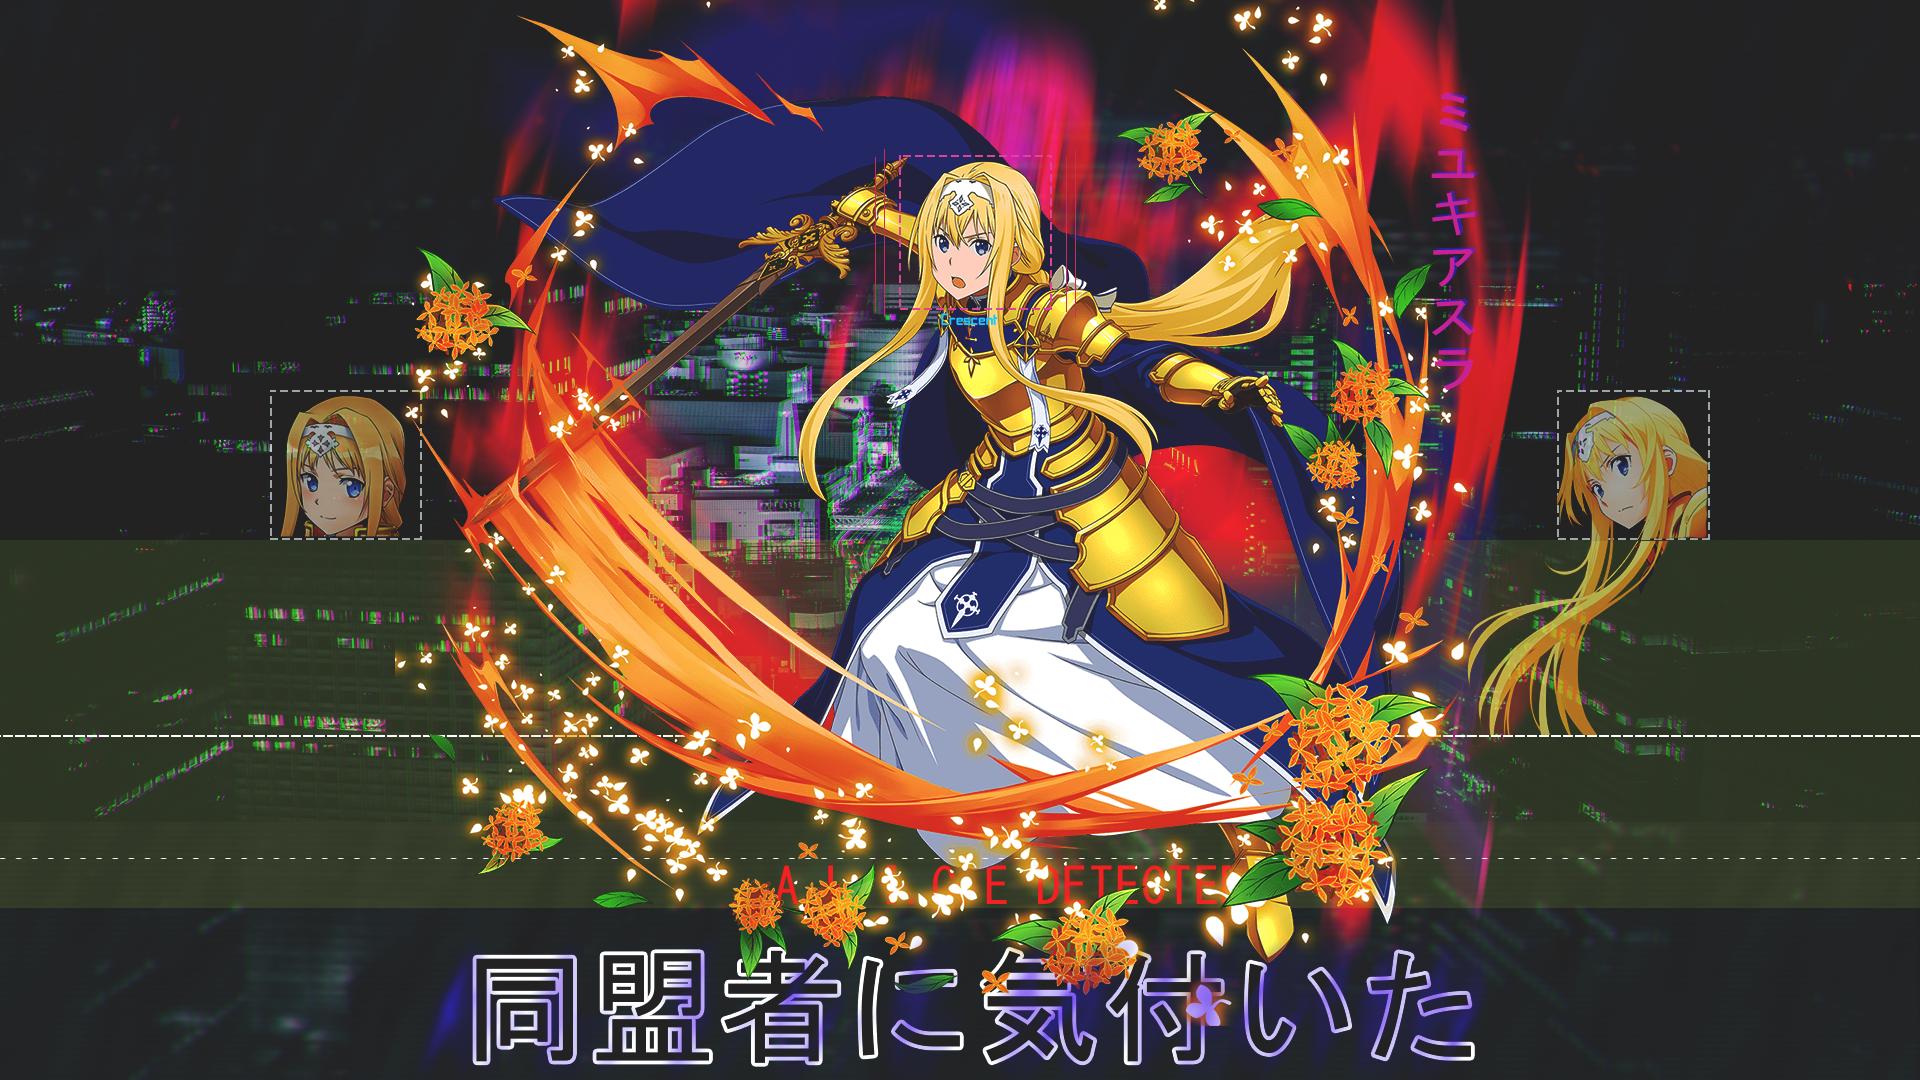 Wallpaper Sword Art Online Alicization Anime Girls 1920x1080